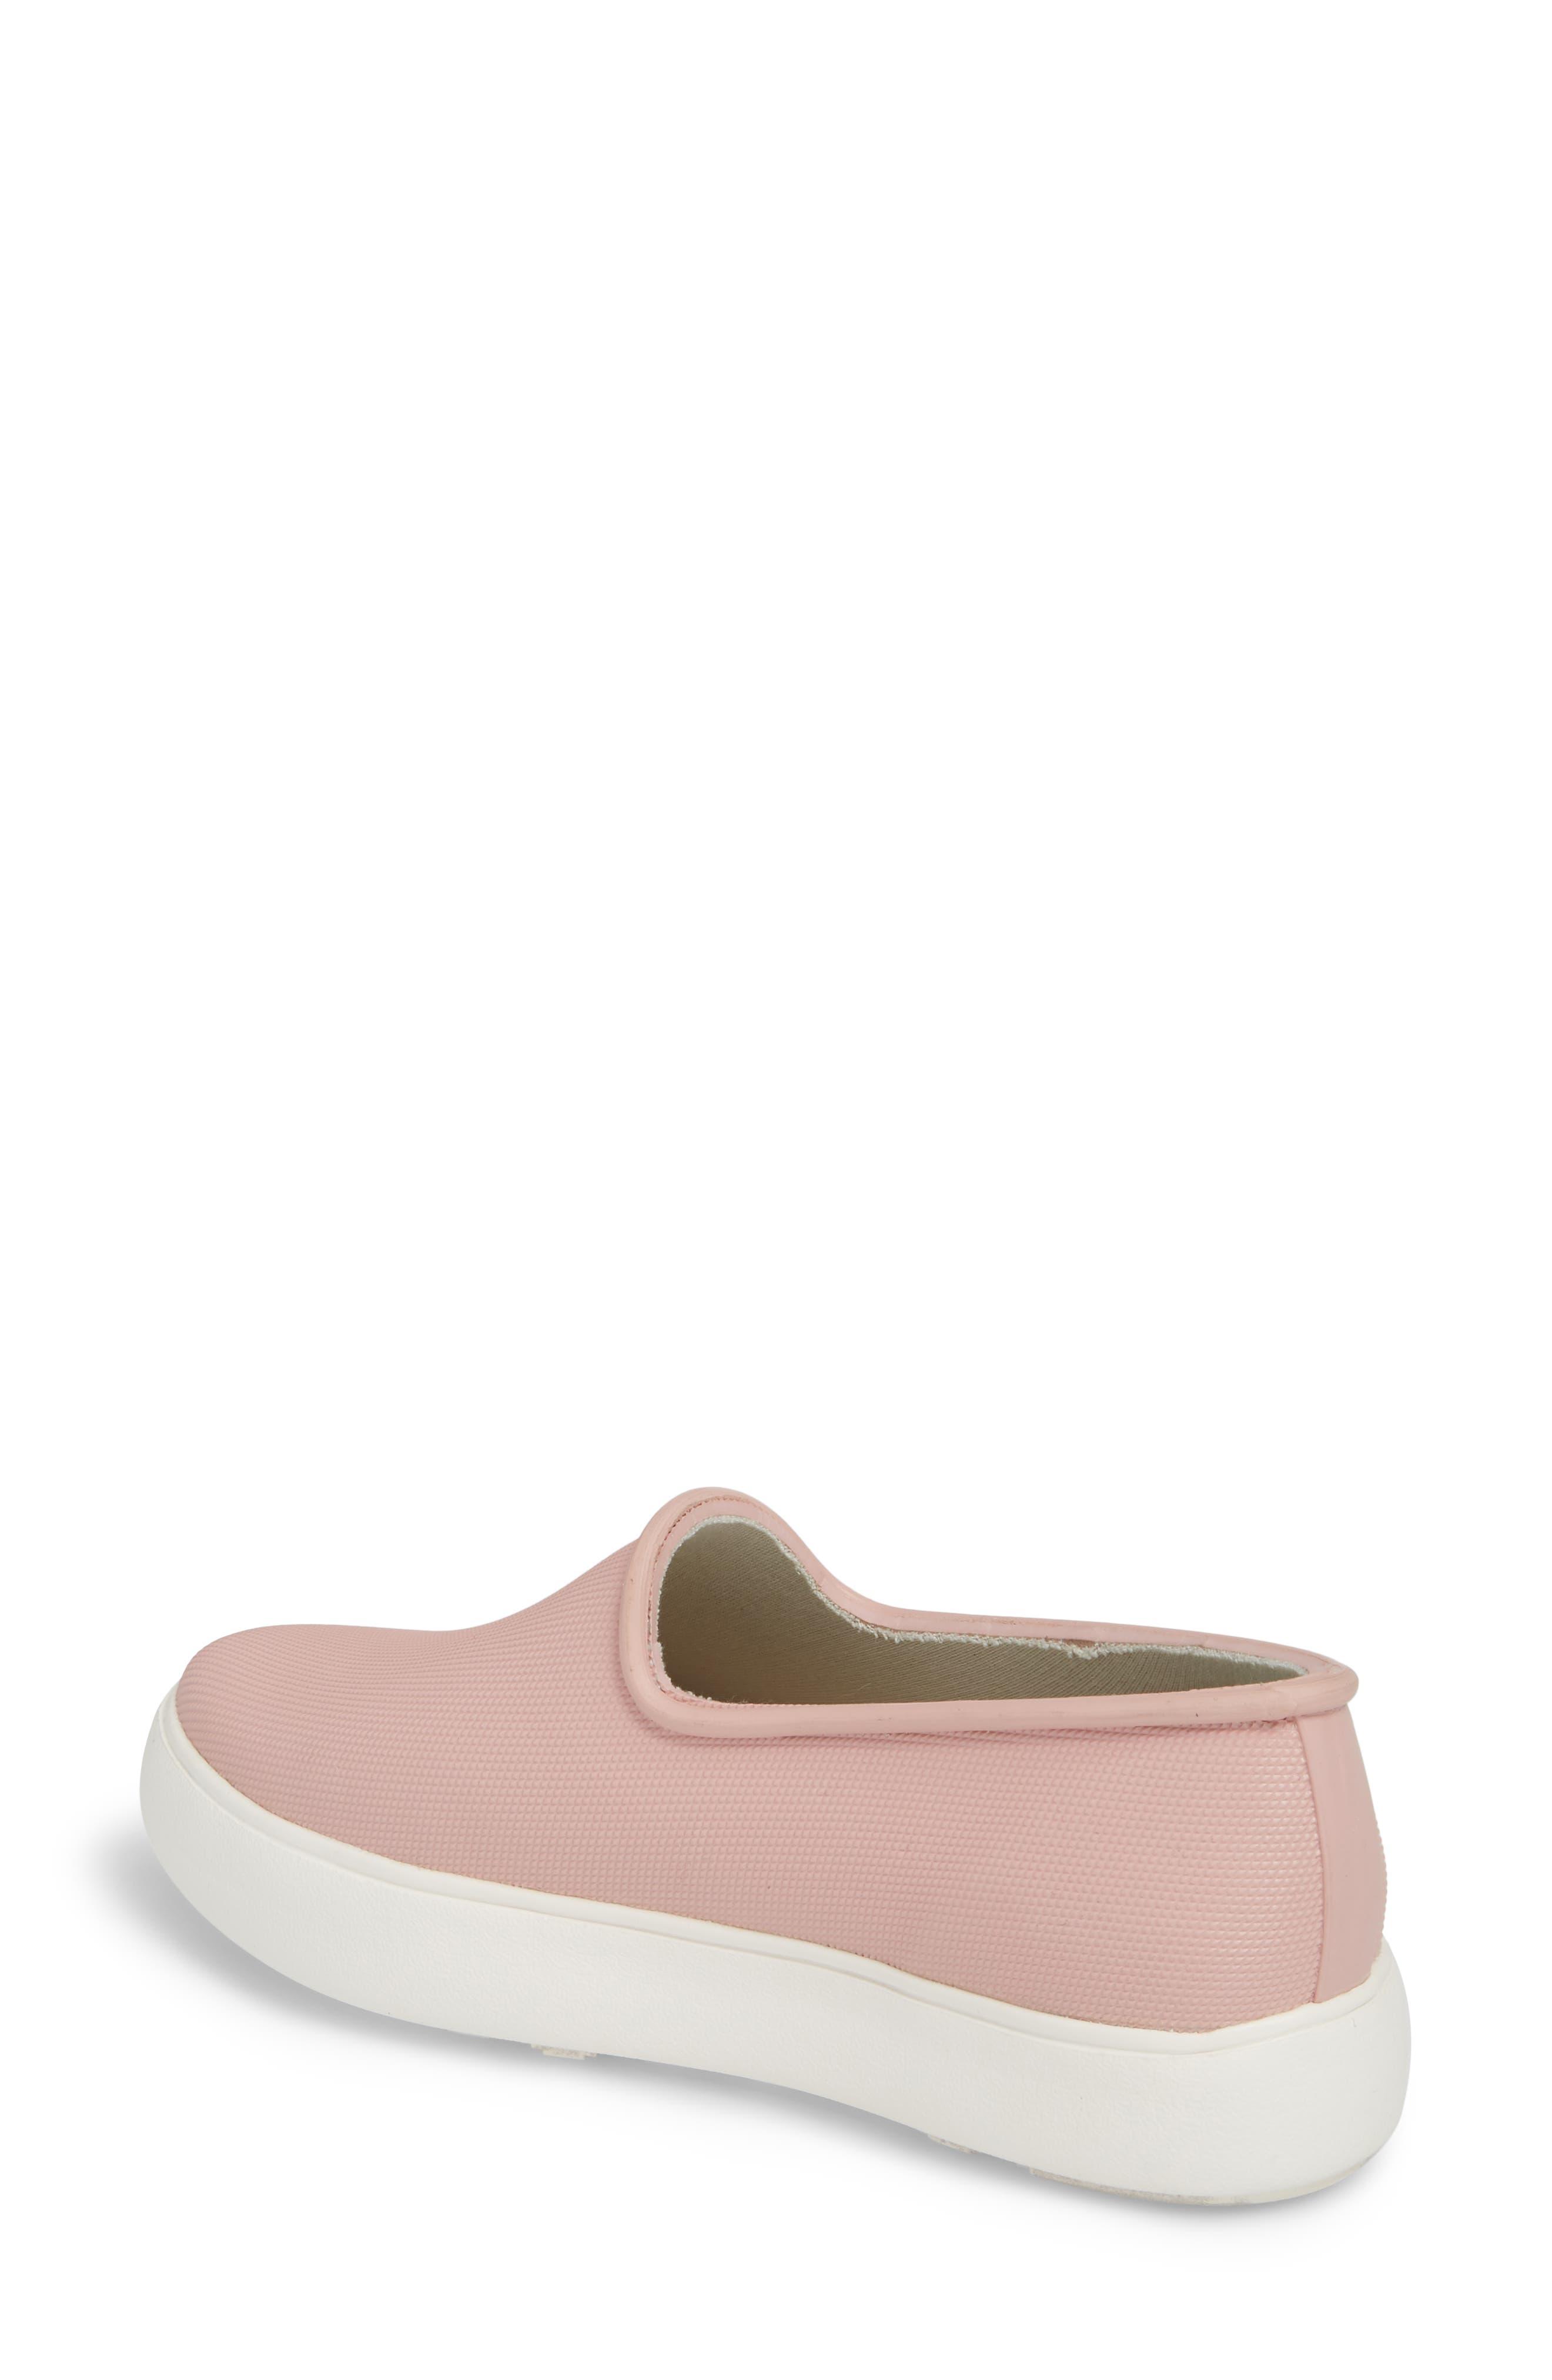 Rainy Day Waterproof Slip-On Sneaker,                             Alternate thumbnail 2, color,                             Dusty Pink